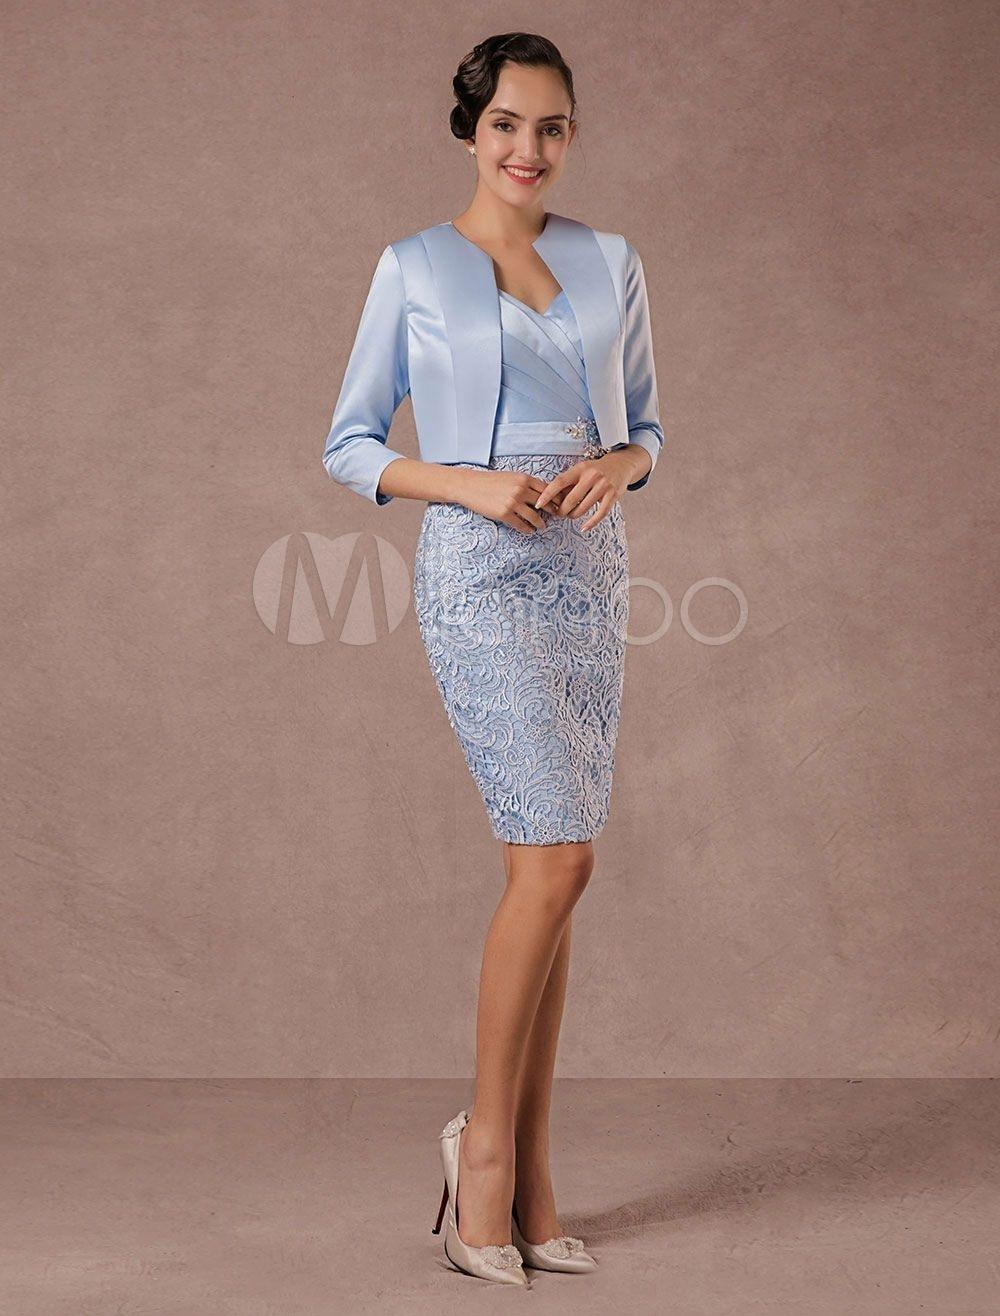 13 Genial Kleid Mit Jacke Elegant Ärmel Luxurius Kleid Mit Jacke Elegant Ärmel